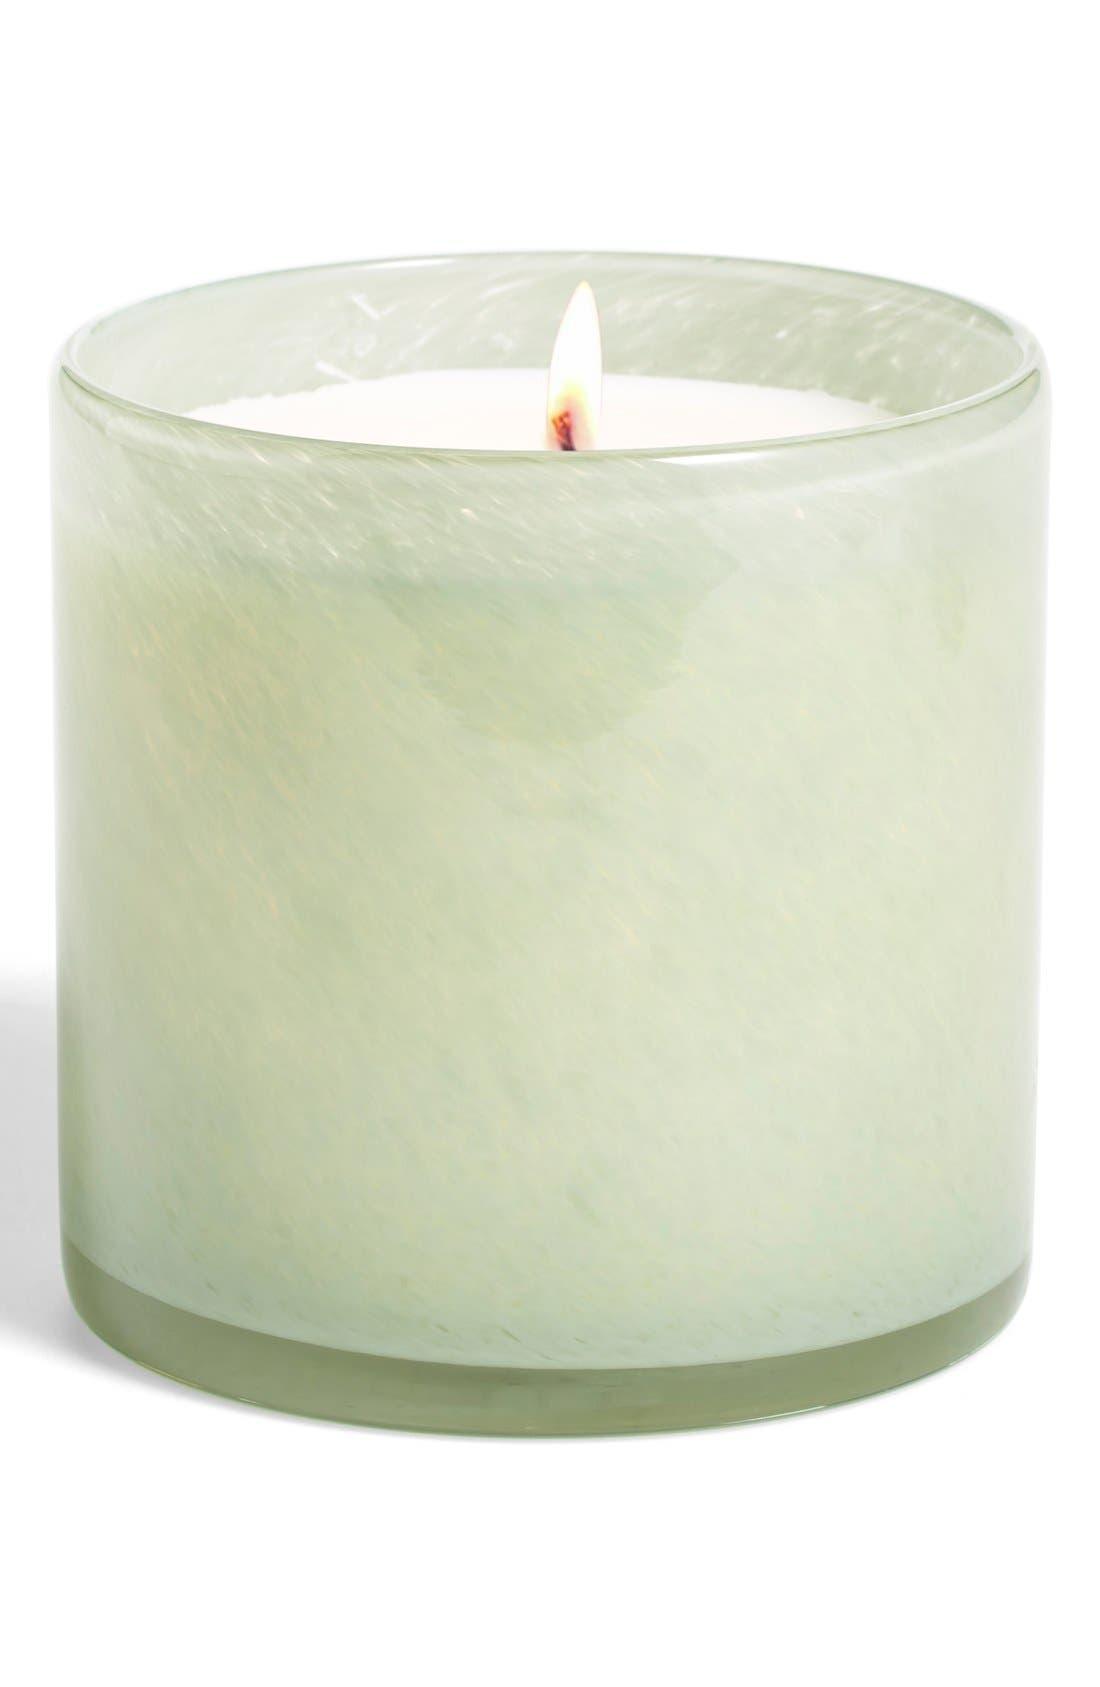 'Fresh Cut Gardenia - Living Room' Candle,                             Main thumbnail 1, color,                             NO COLOR